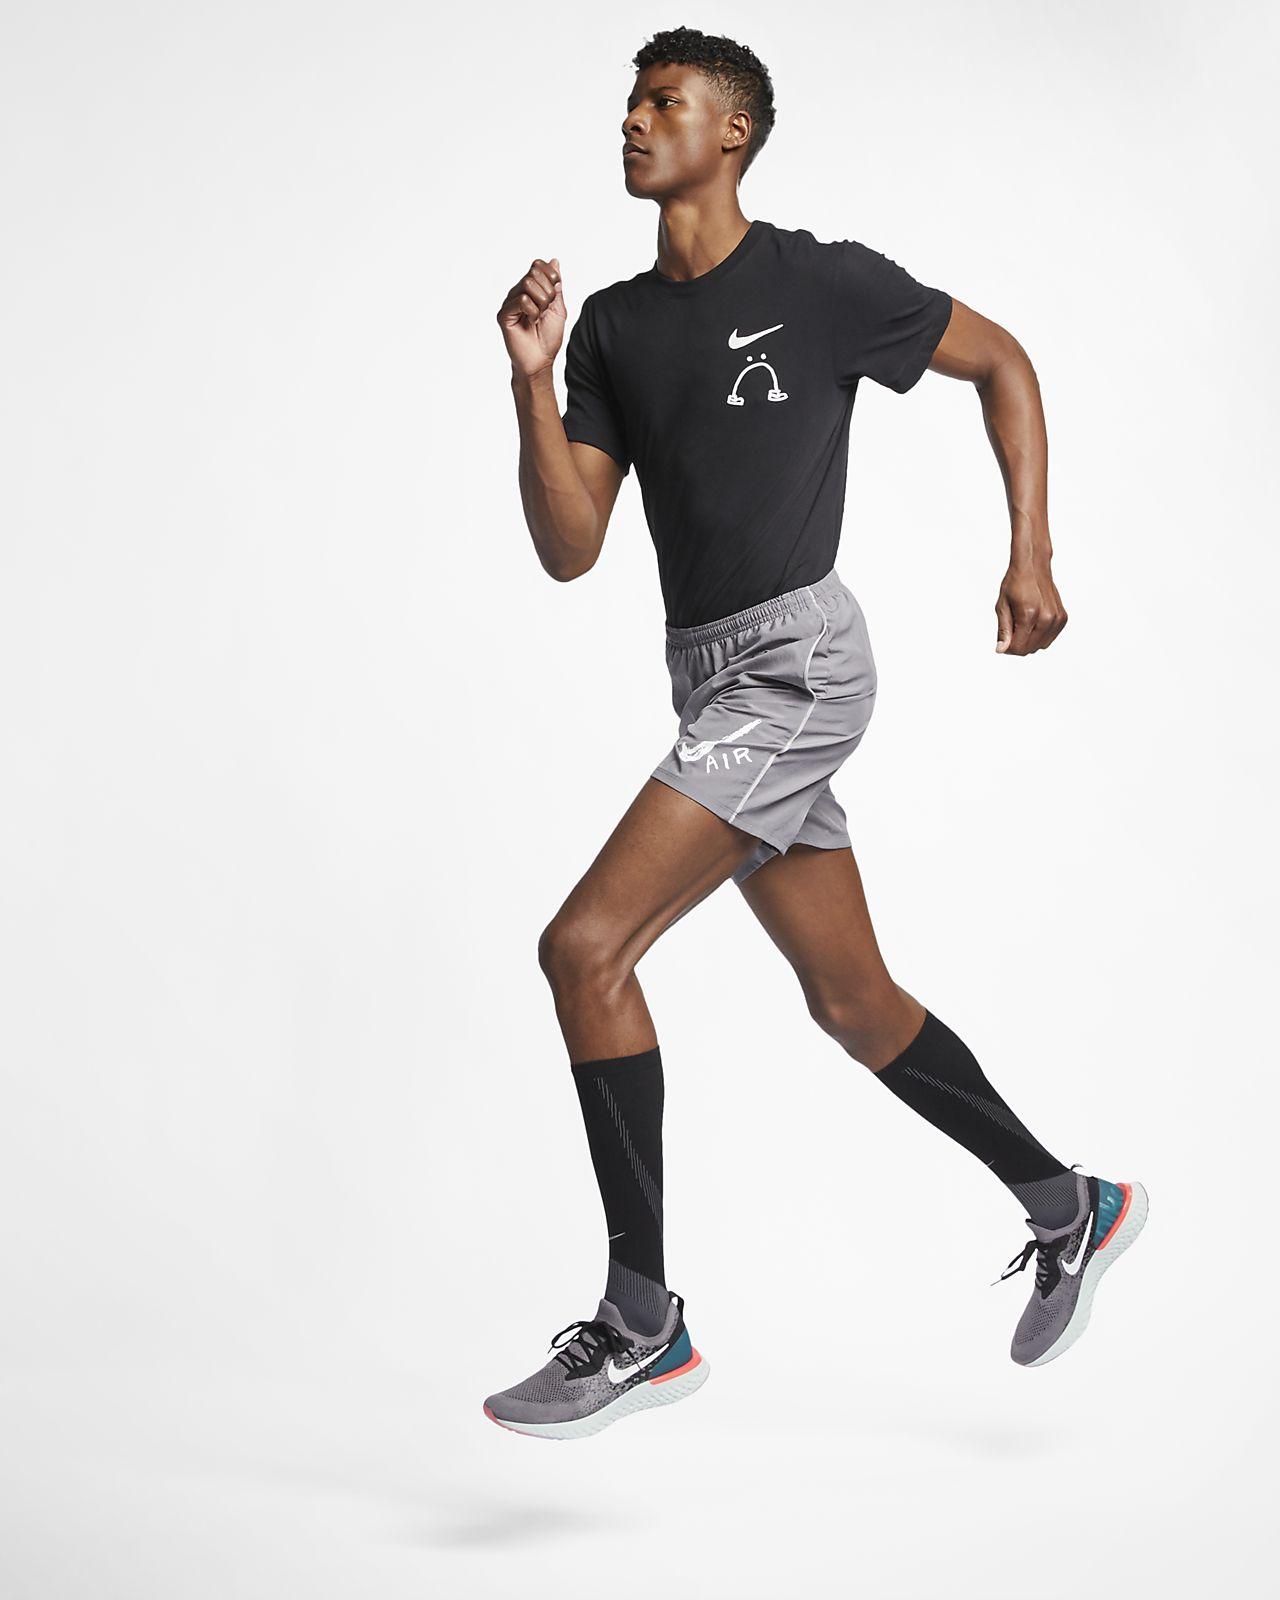 d9e422e5b9 Nike Dri-FIT Nathan Bell Men's Running T-Shirt. Nike.com RO